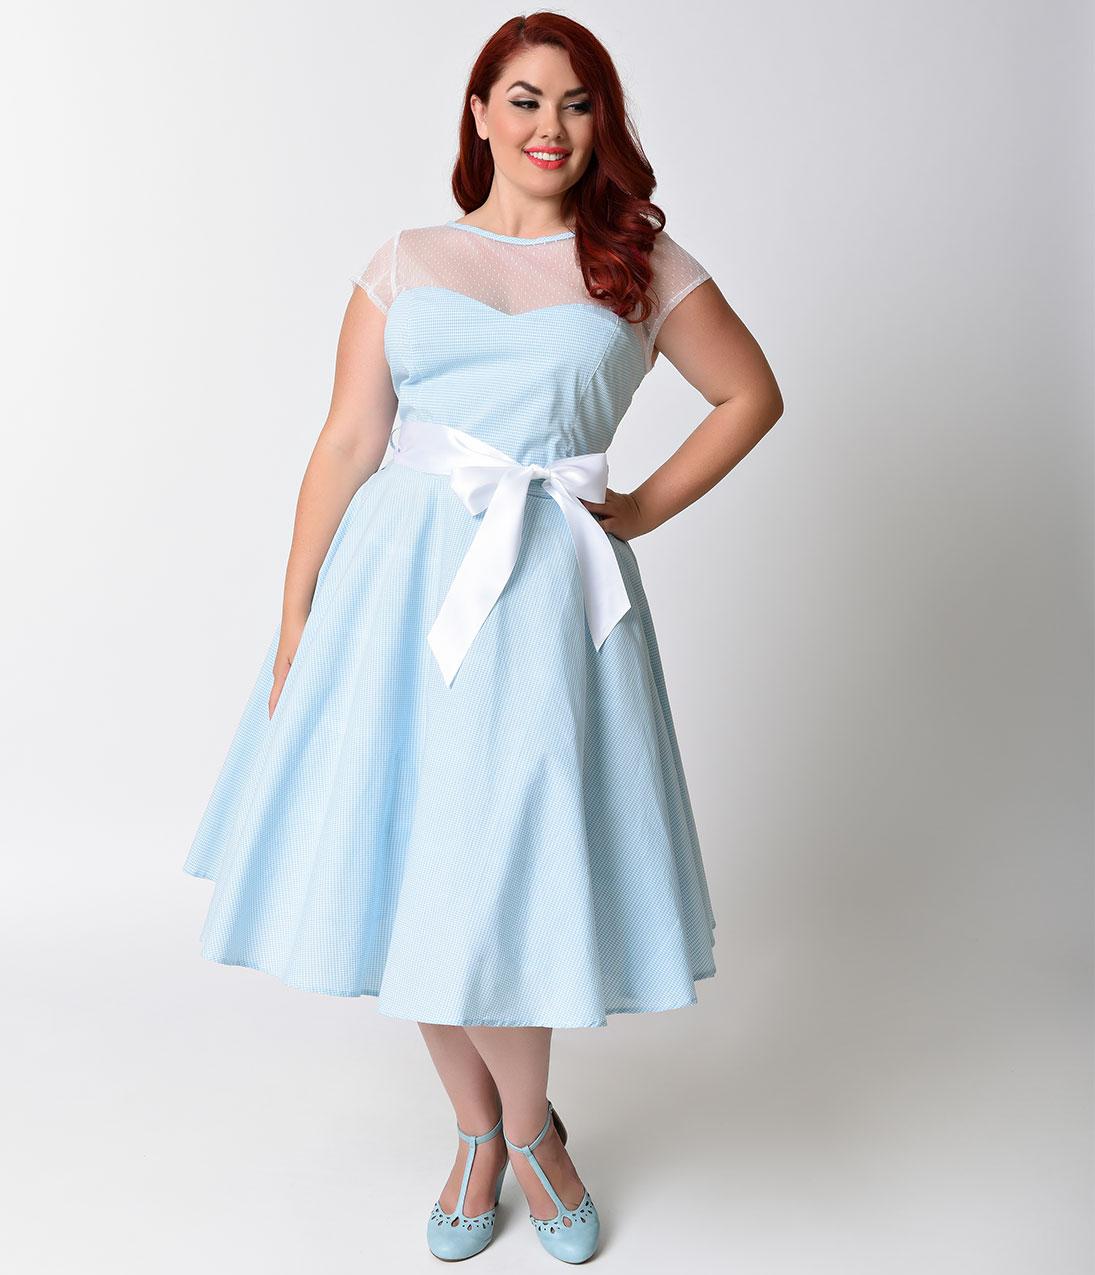 Hell_Bunny_Plus_Size_1950s_Style_Light_Blue_Gingham_Maisy_Swing_Dress.jpg